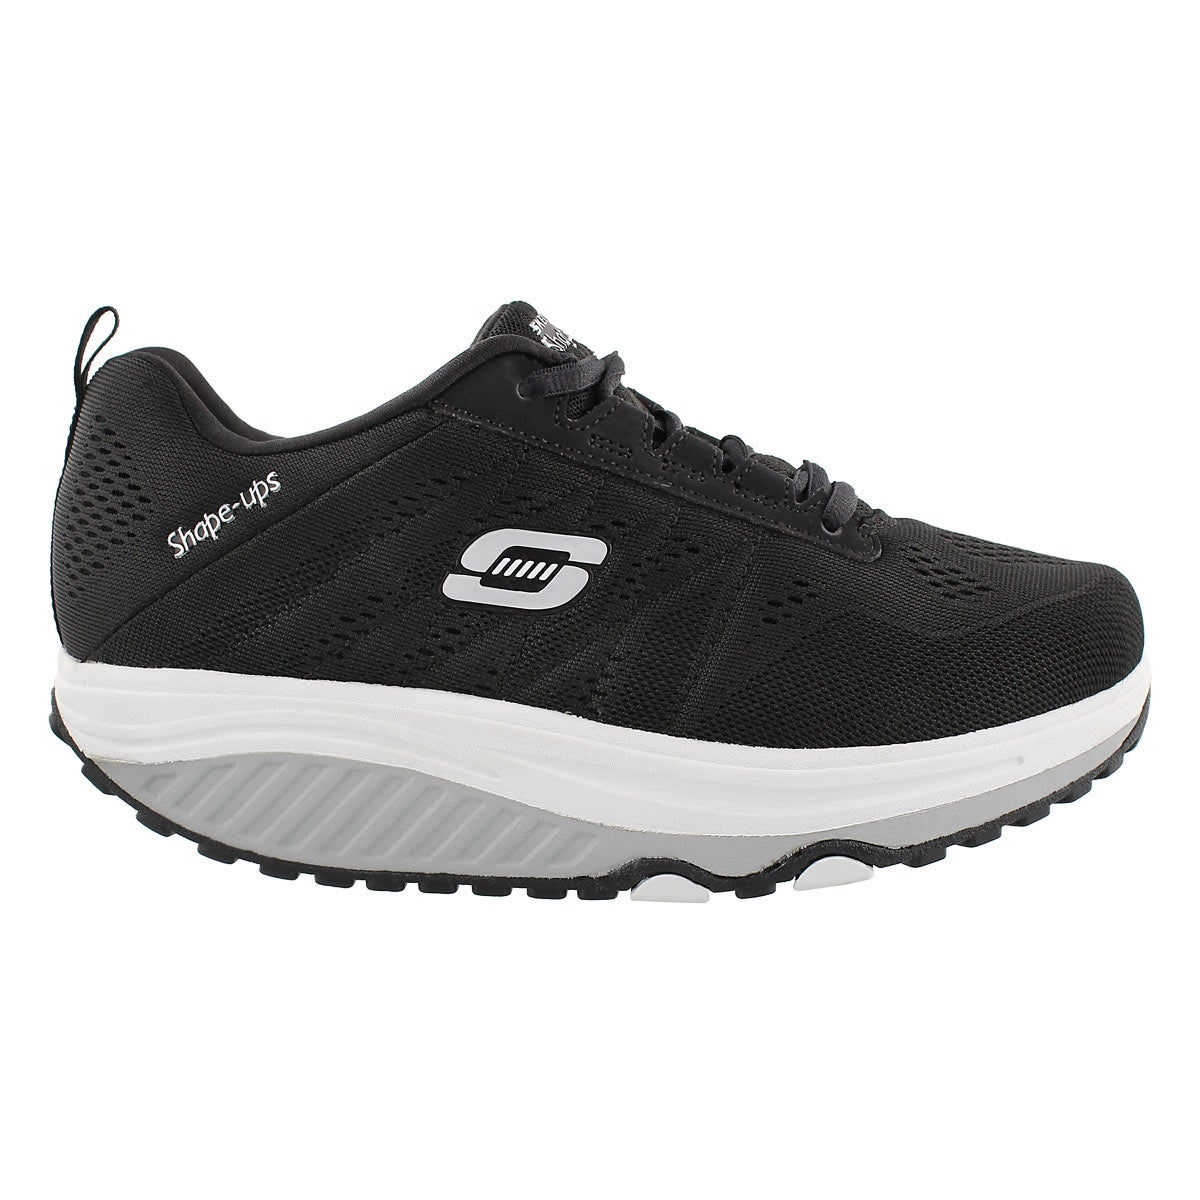 Lds Shape-Ups 2.0 blk/wht walking shoe